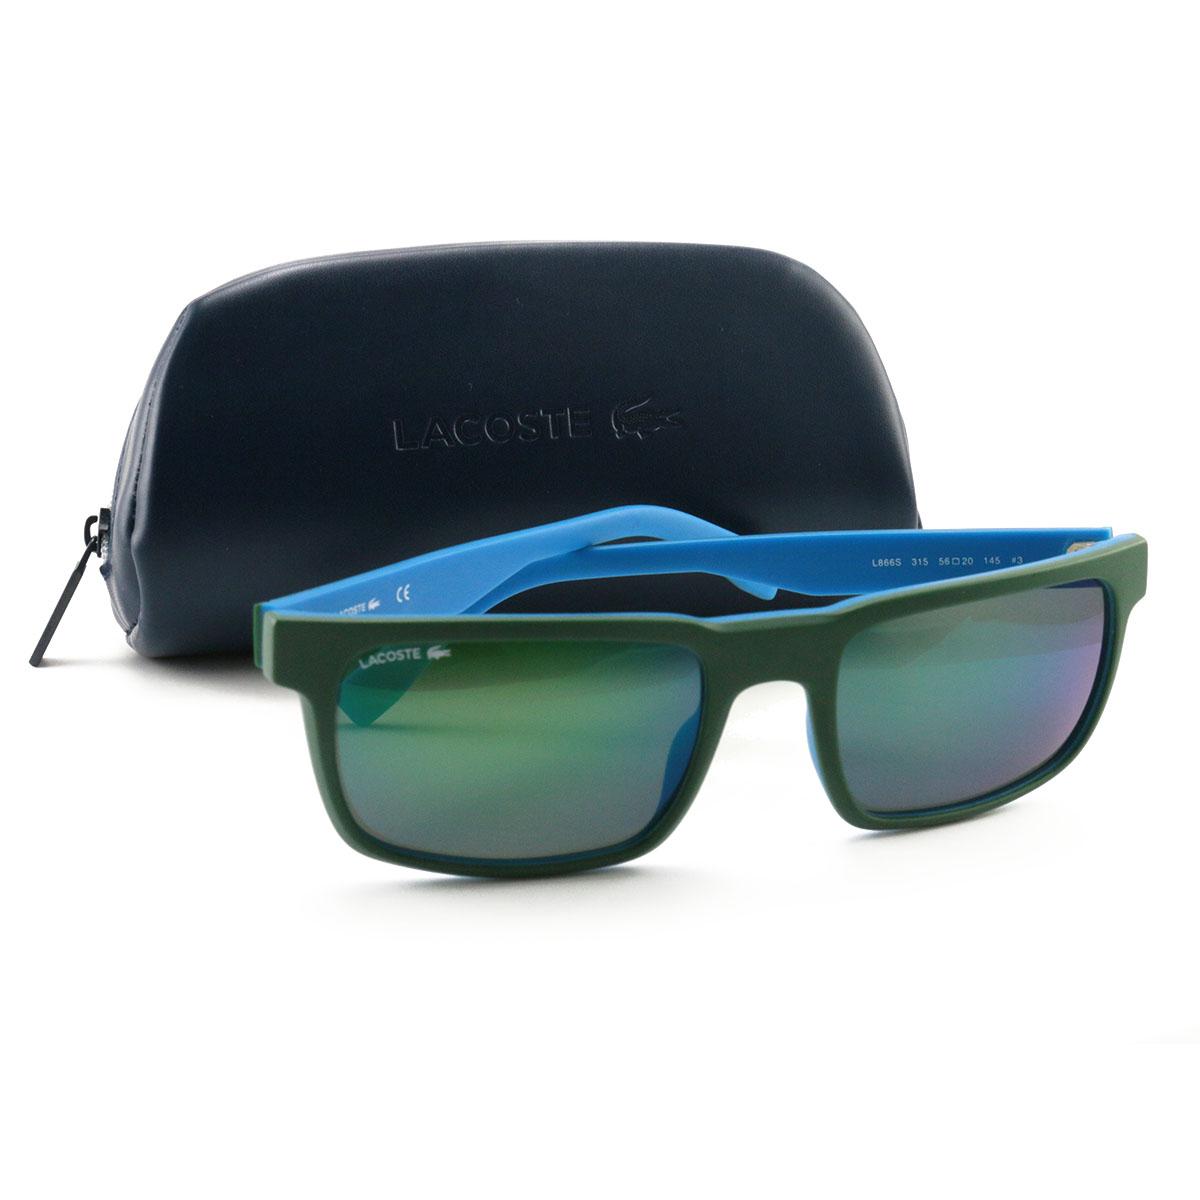 3511c64e218 Details about Lacoste Sunglasses L866S 315 Matte Green Grenn Flash 56 20  145 Mirror